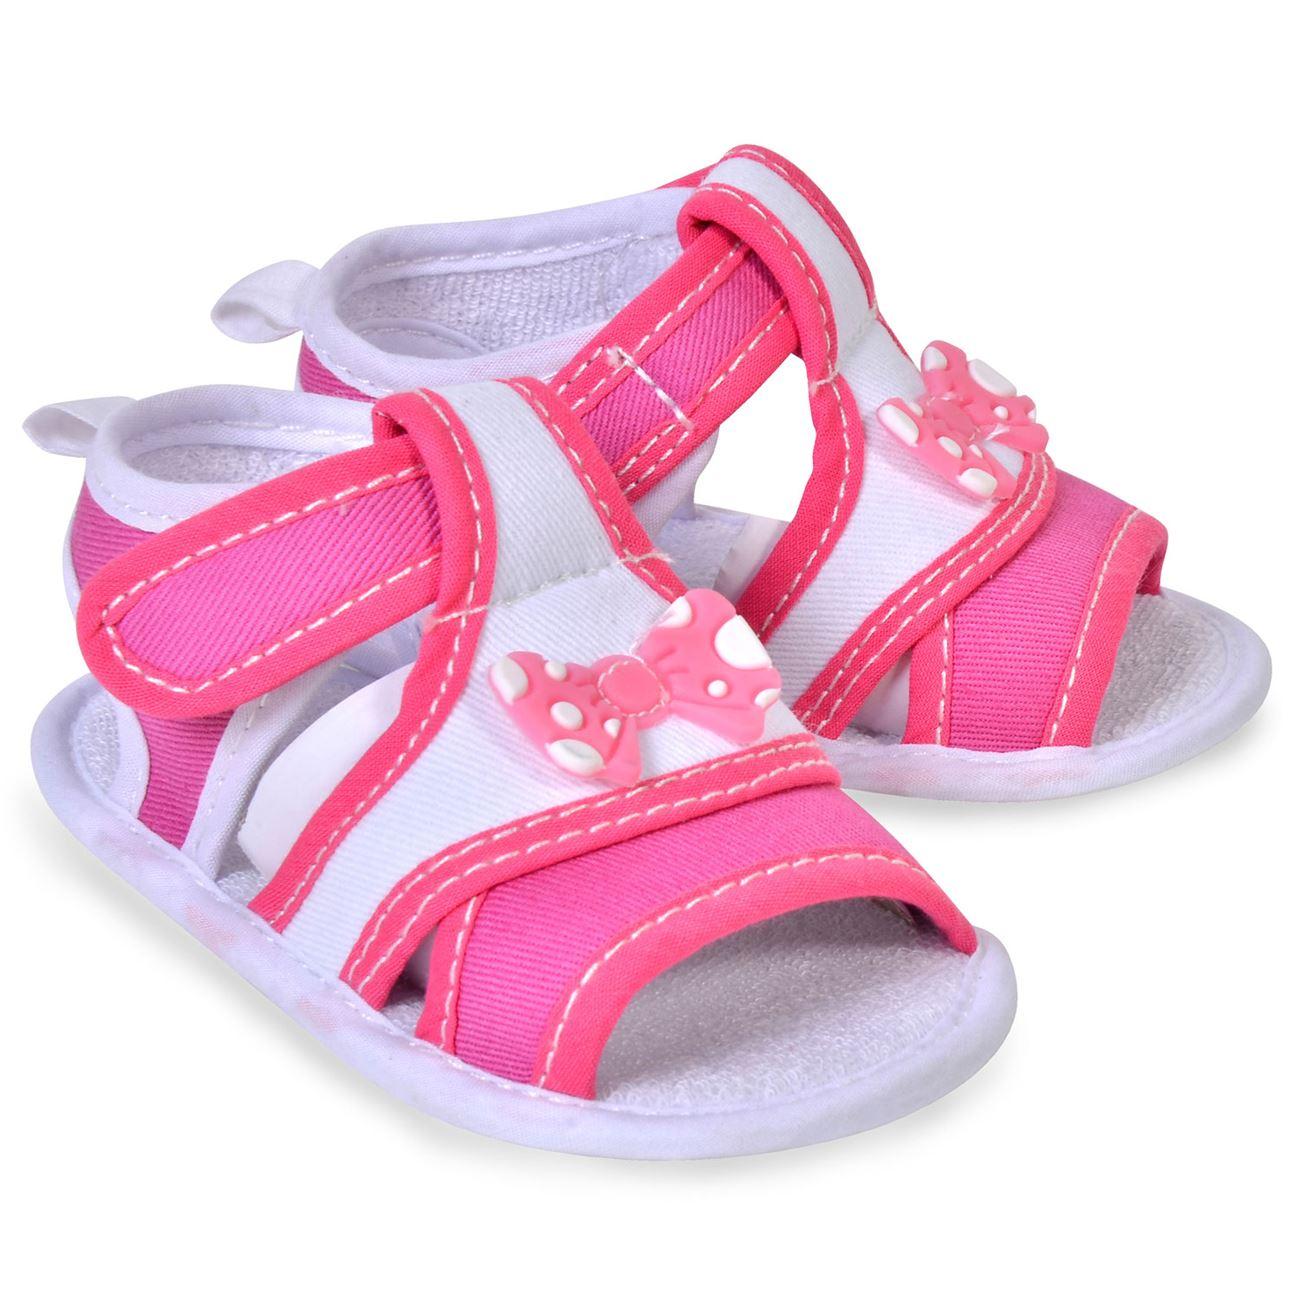 7ebaff0383c Βρεφικά Παπούτσια < Πέδιλα Καλοκαιρινά Βρεφικά Κορίτσι | Jumbo